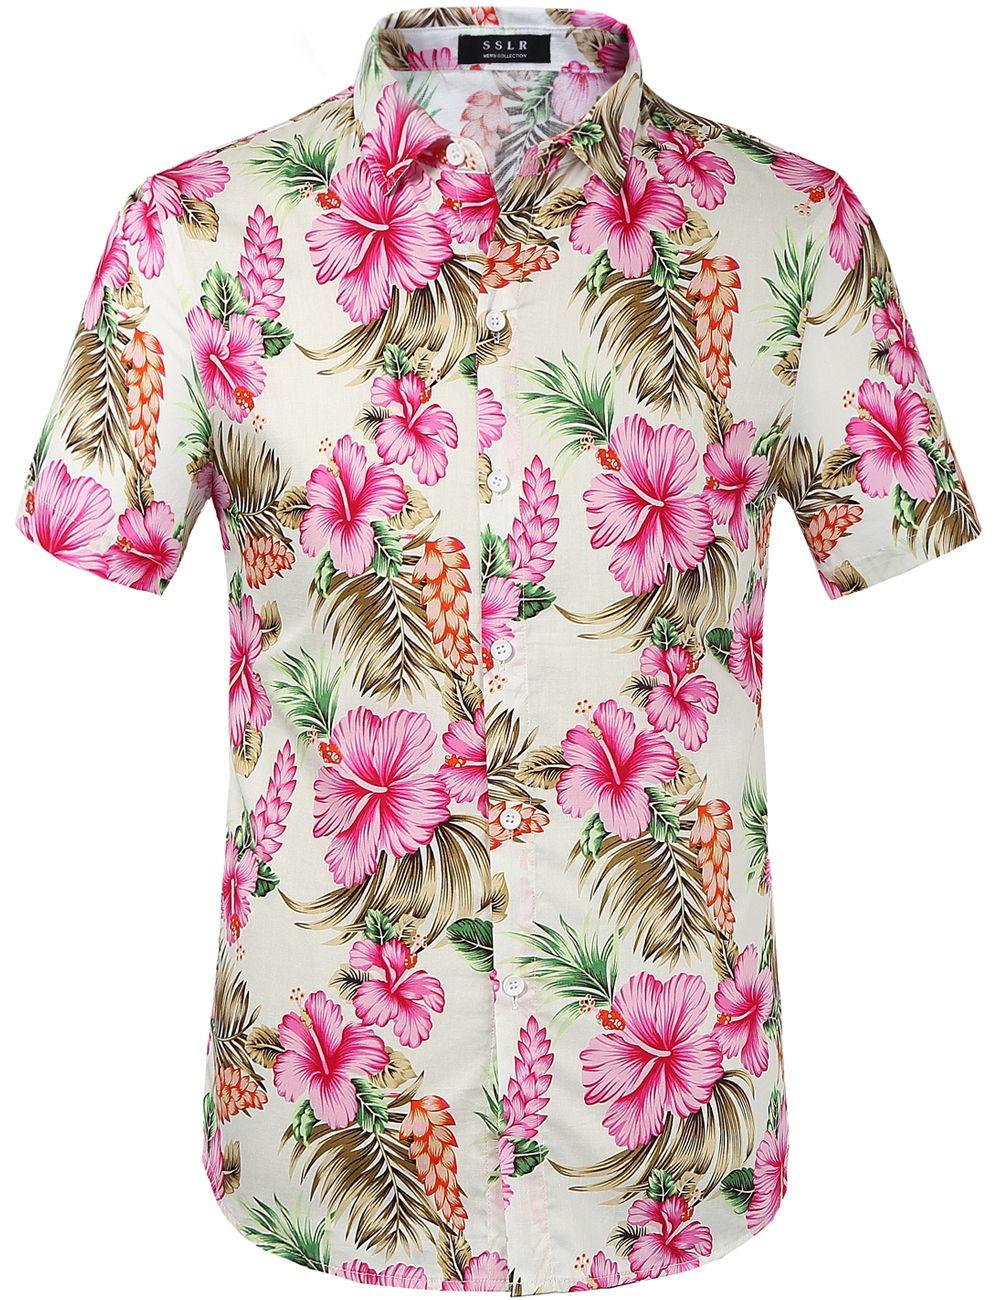 Men Hawaiian Tropical Vintage Floral Print Tee Button Down Cool V-neck Shirt Top